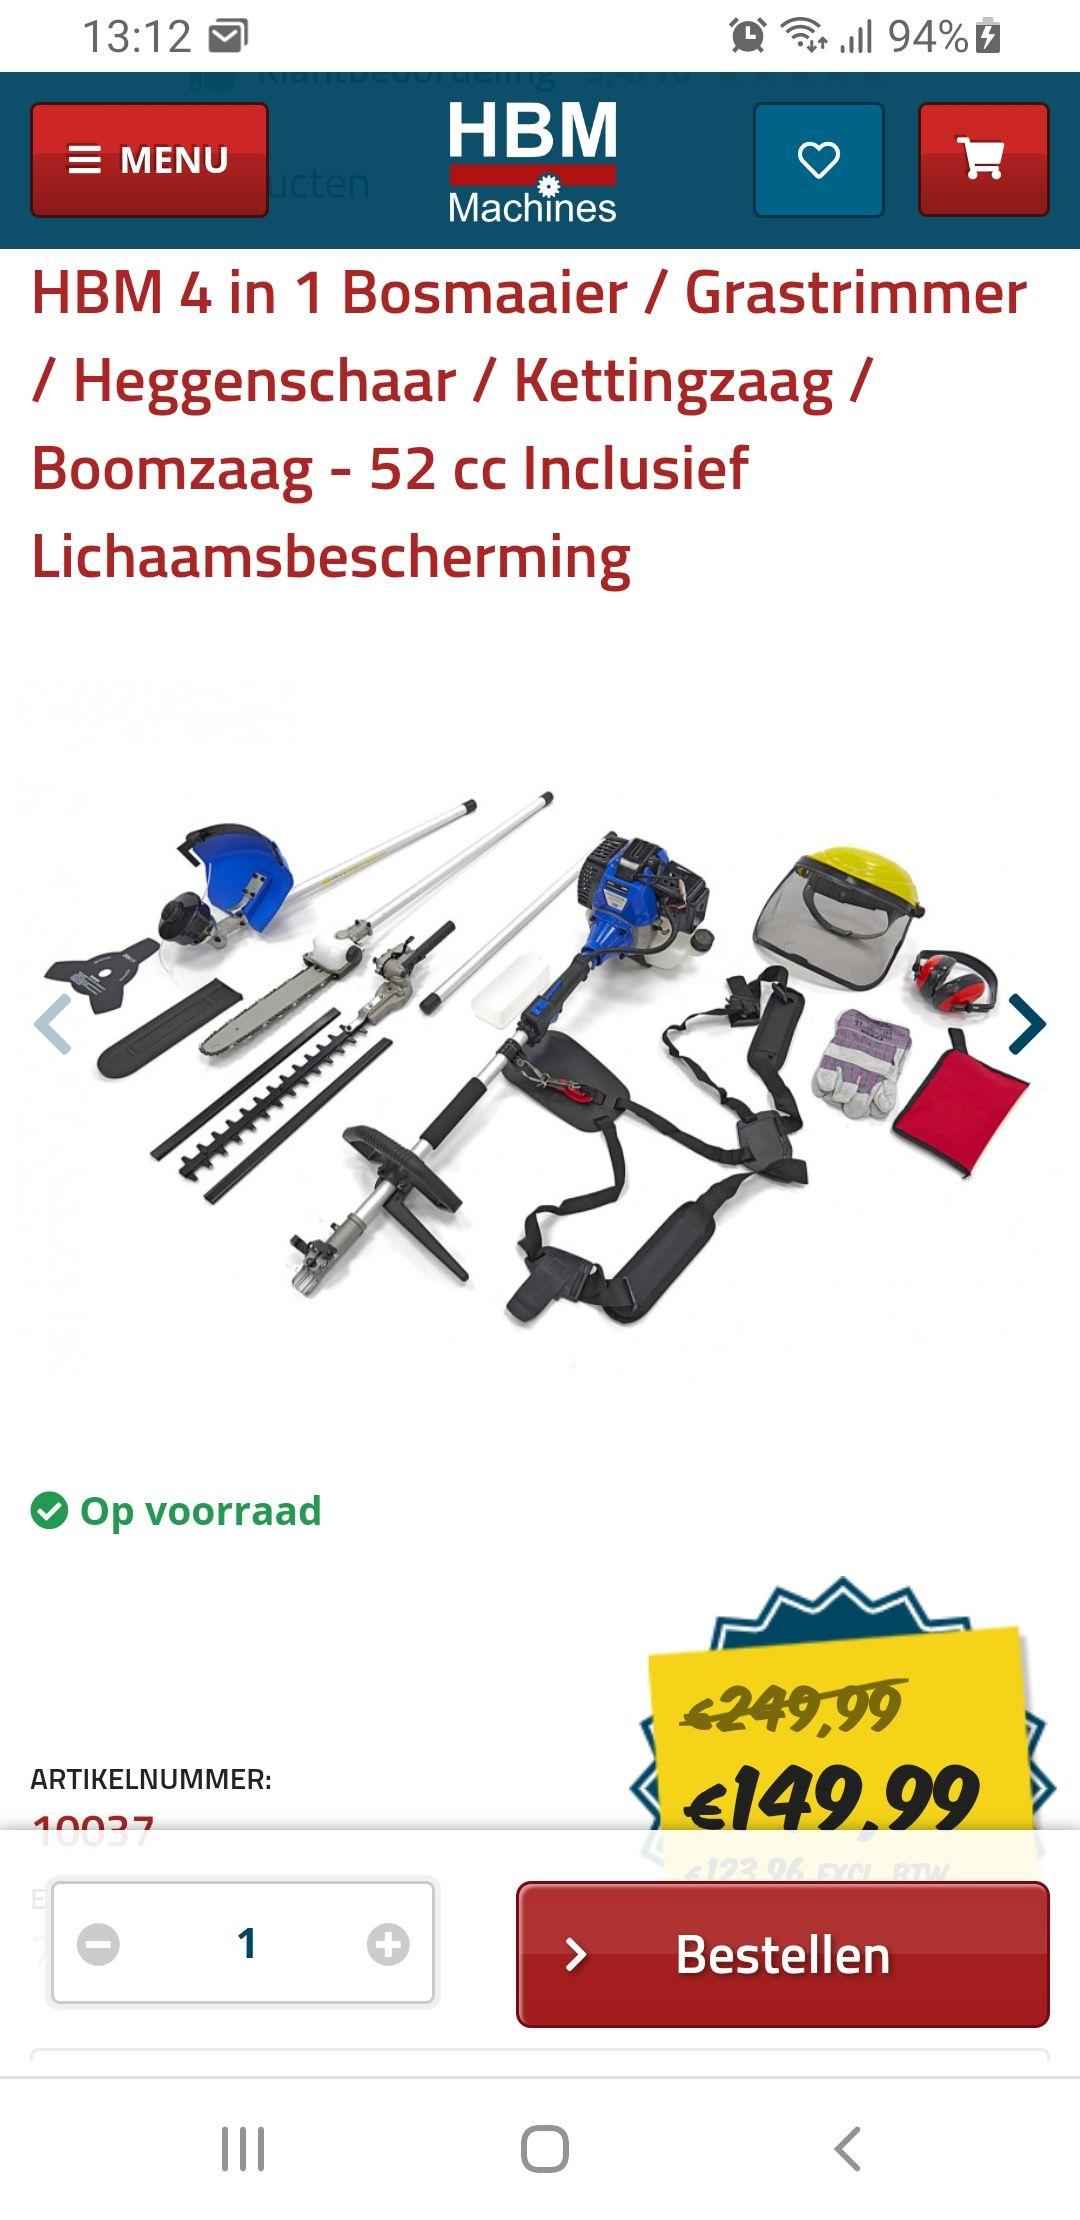 4 in 1 Bosmaaier / Grastrimmer / Heggenschaar / Kettingzaag / Boomzaag - 52 cc Inclusief Lichaamsbescherming